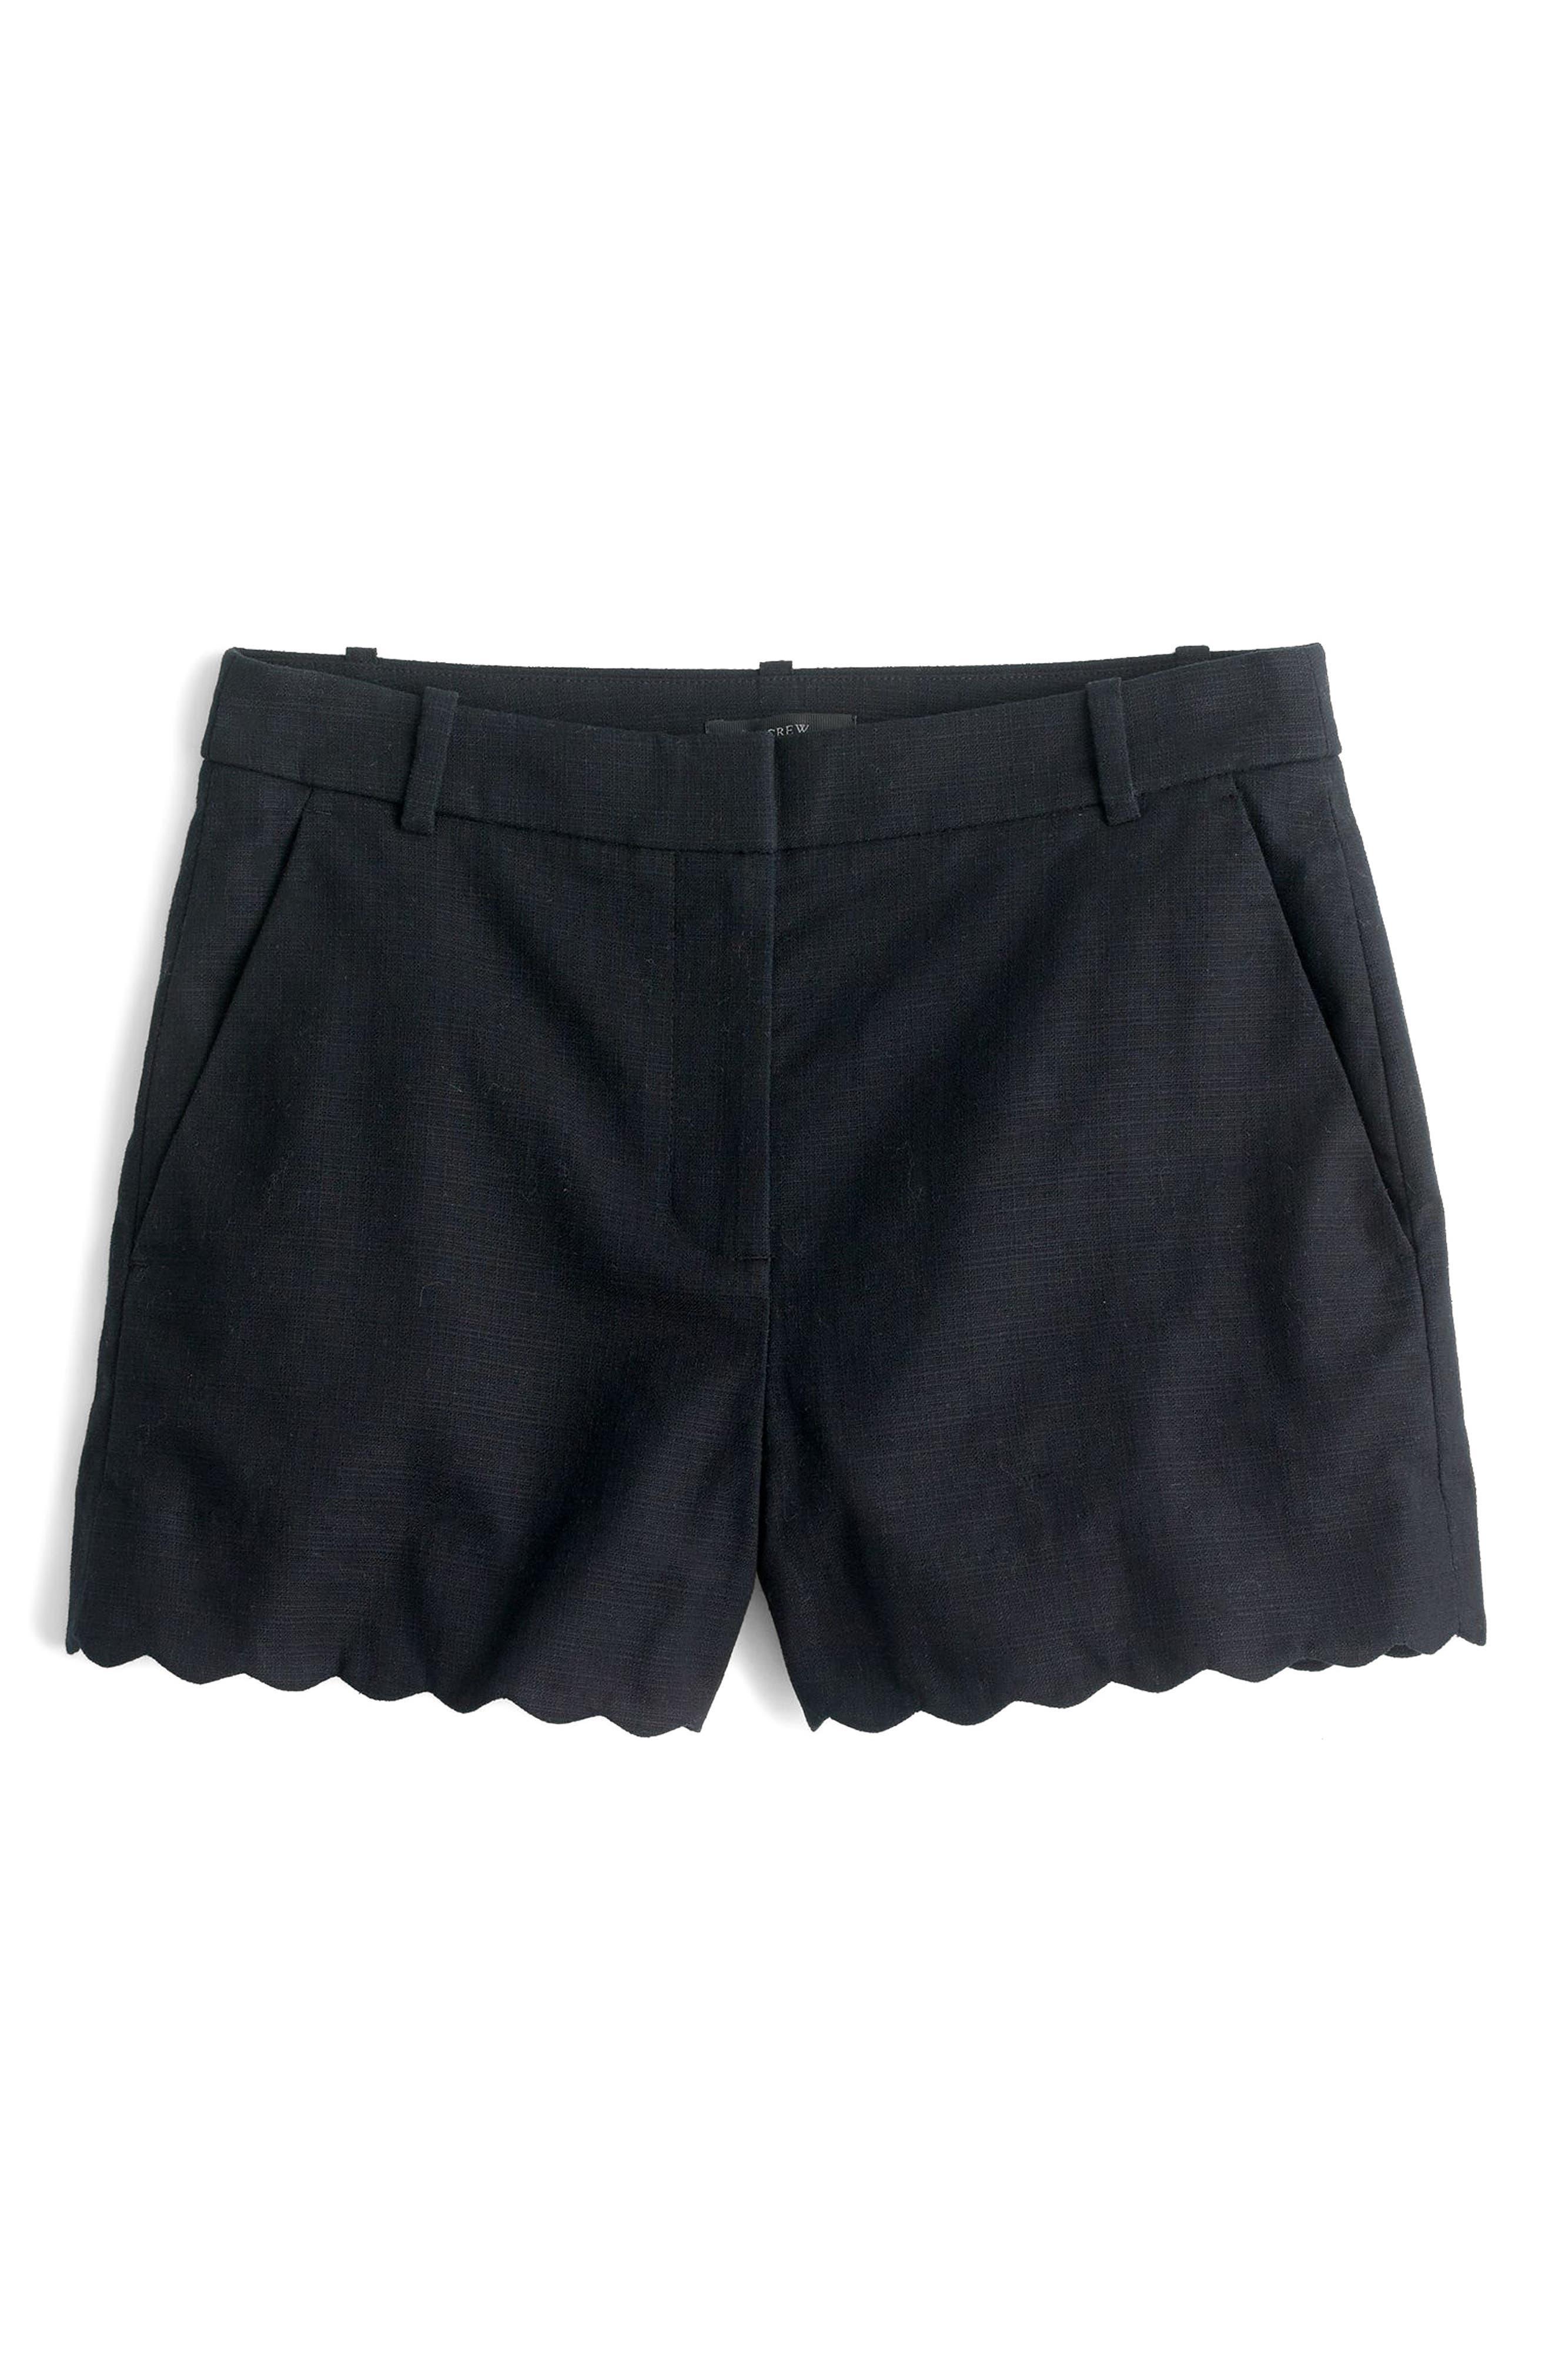 black cotton shorts womens